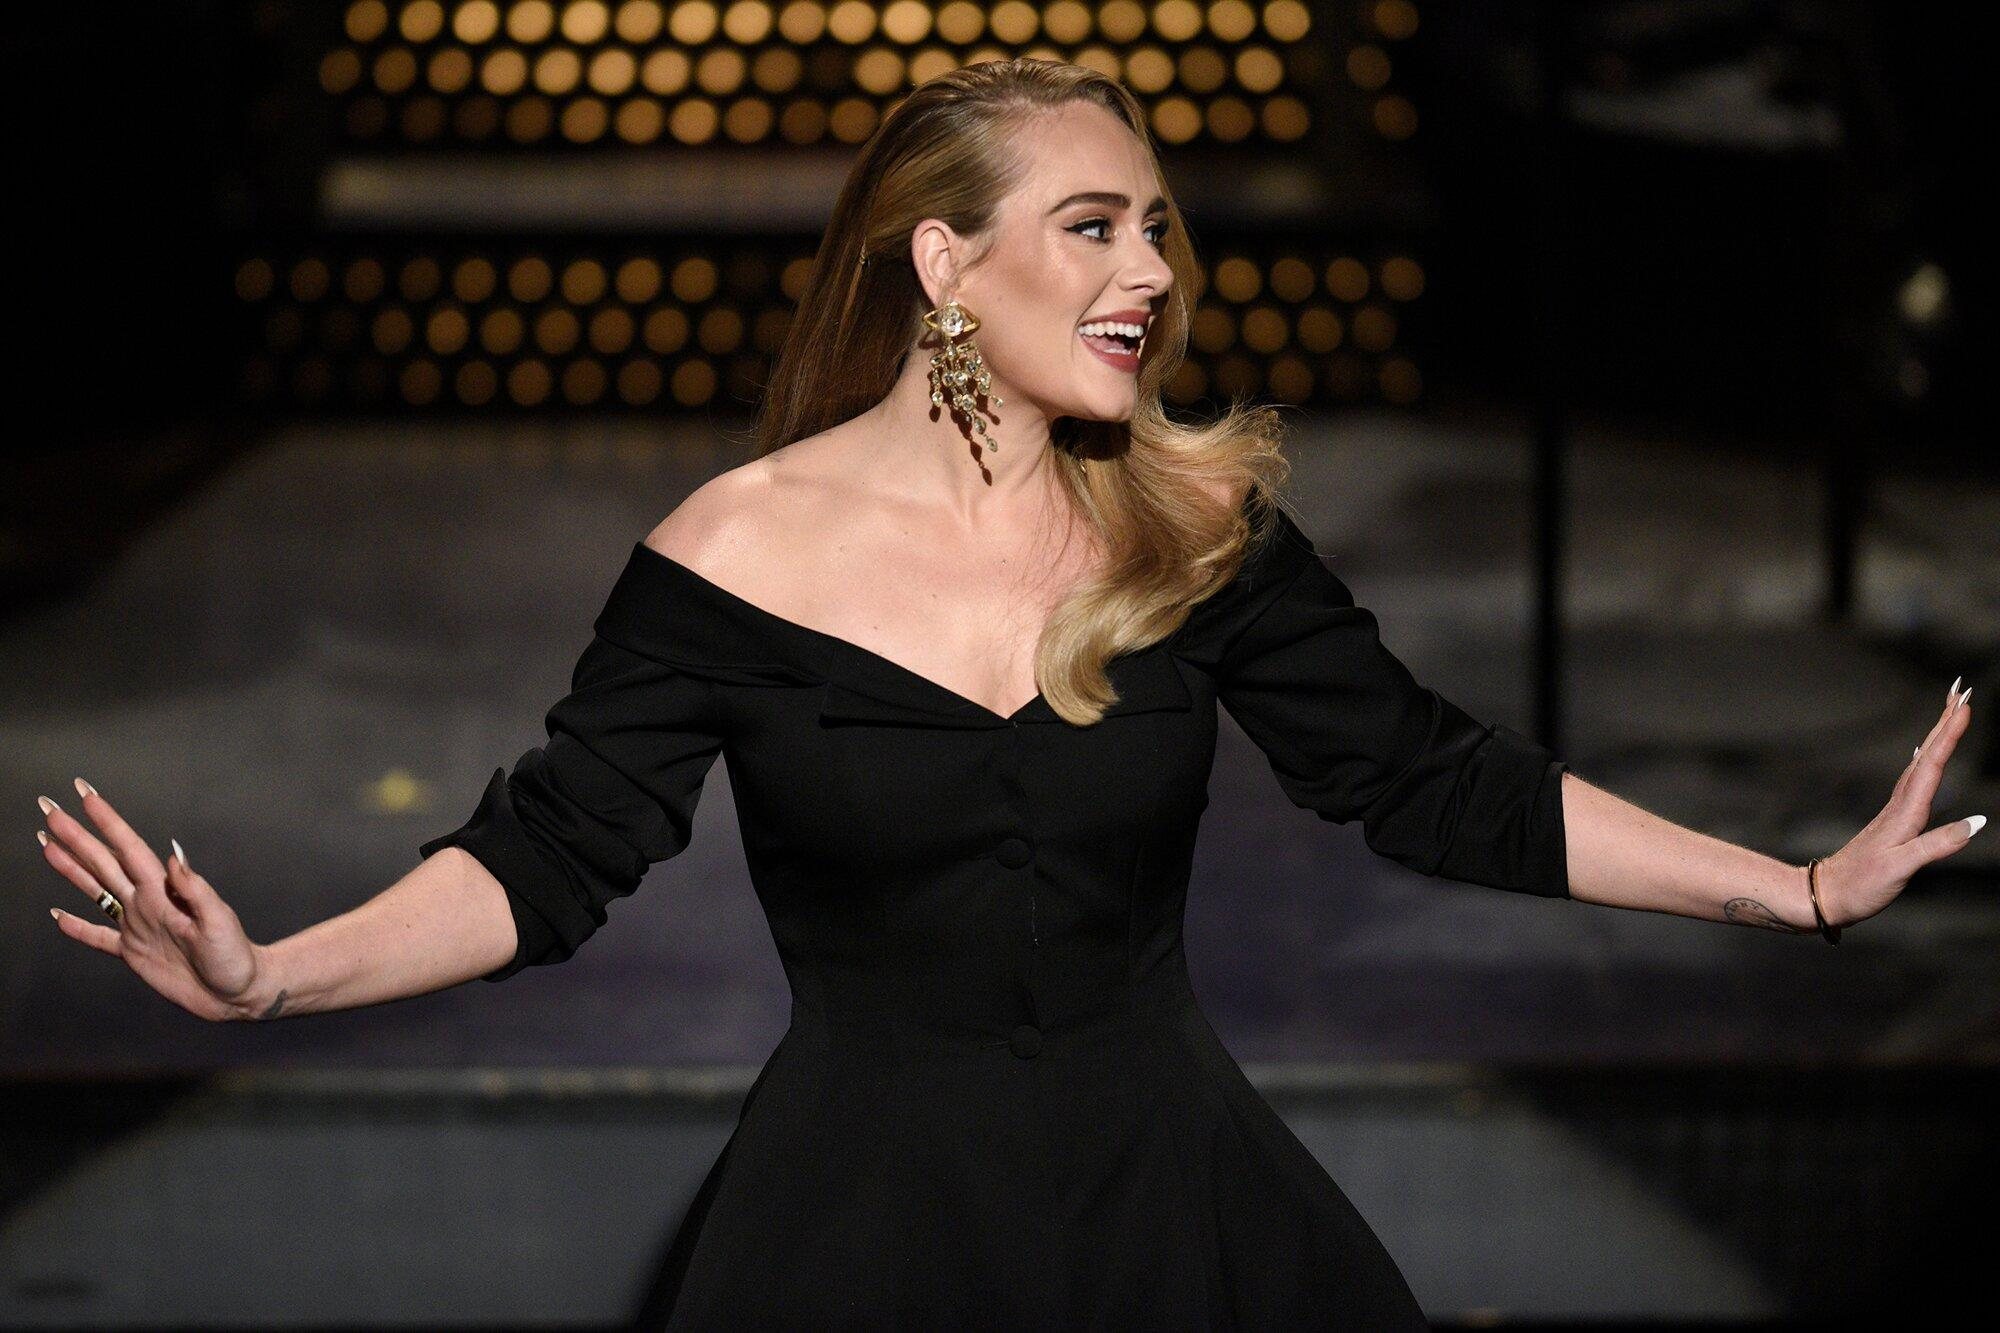 Adele Celebrates Milestone Anniversary of 21 : 'Happy 10 Years Old Friend!'